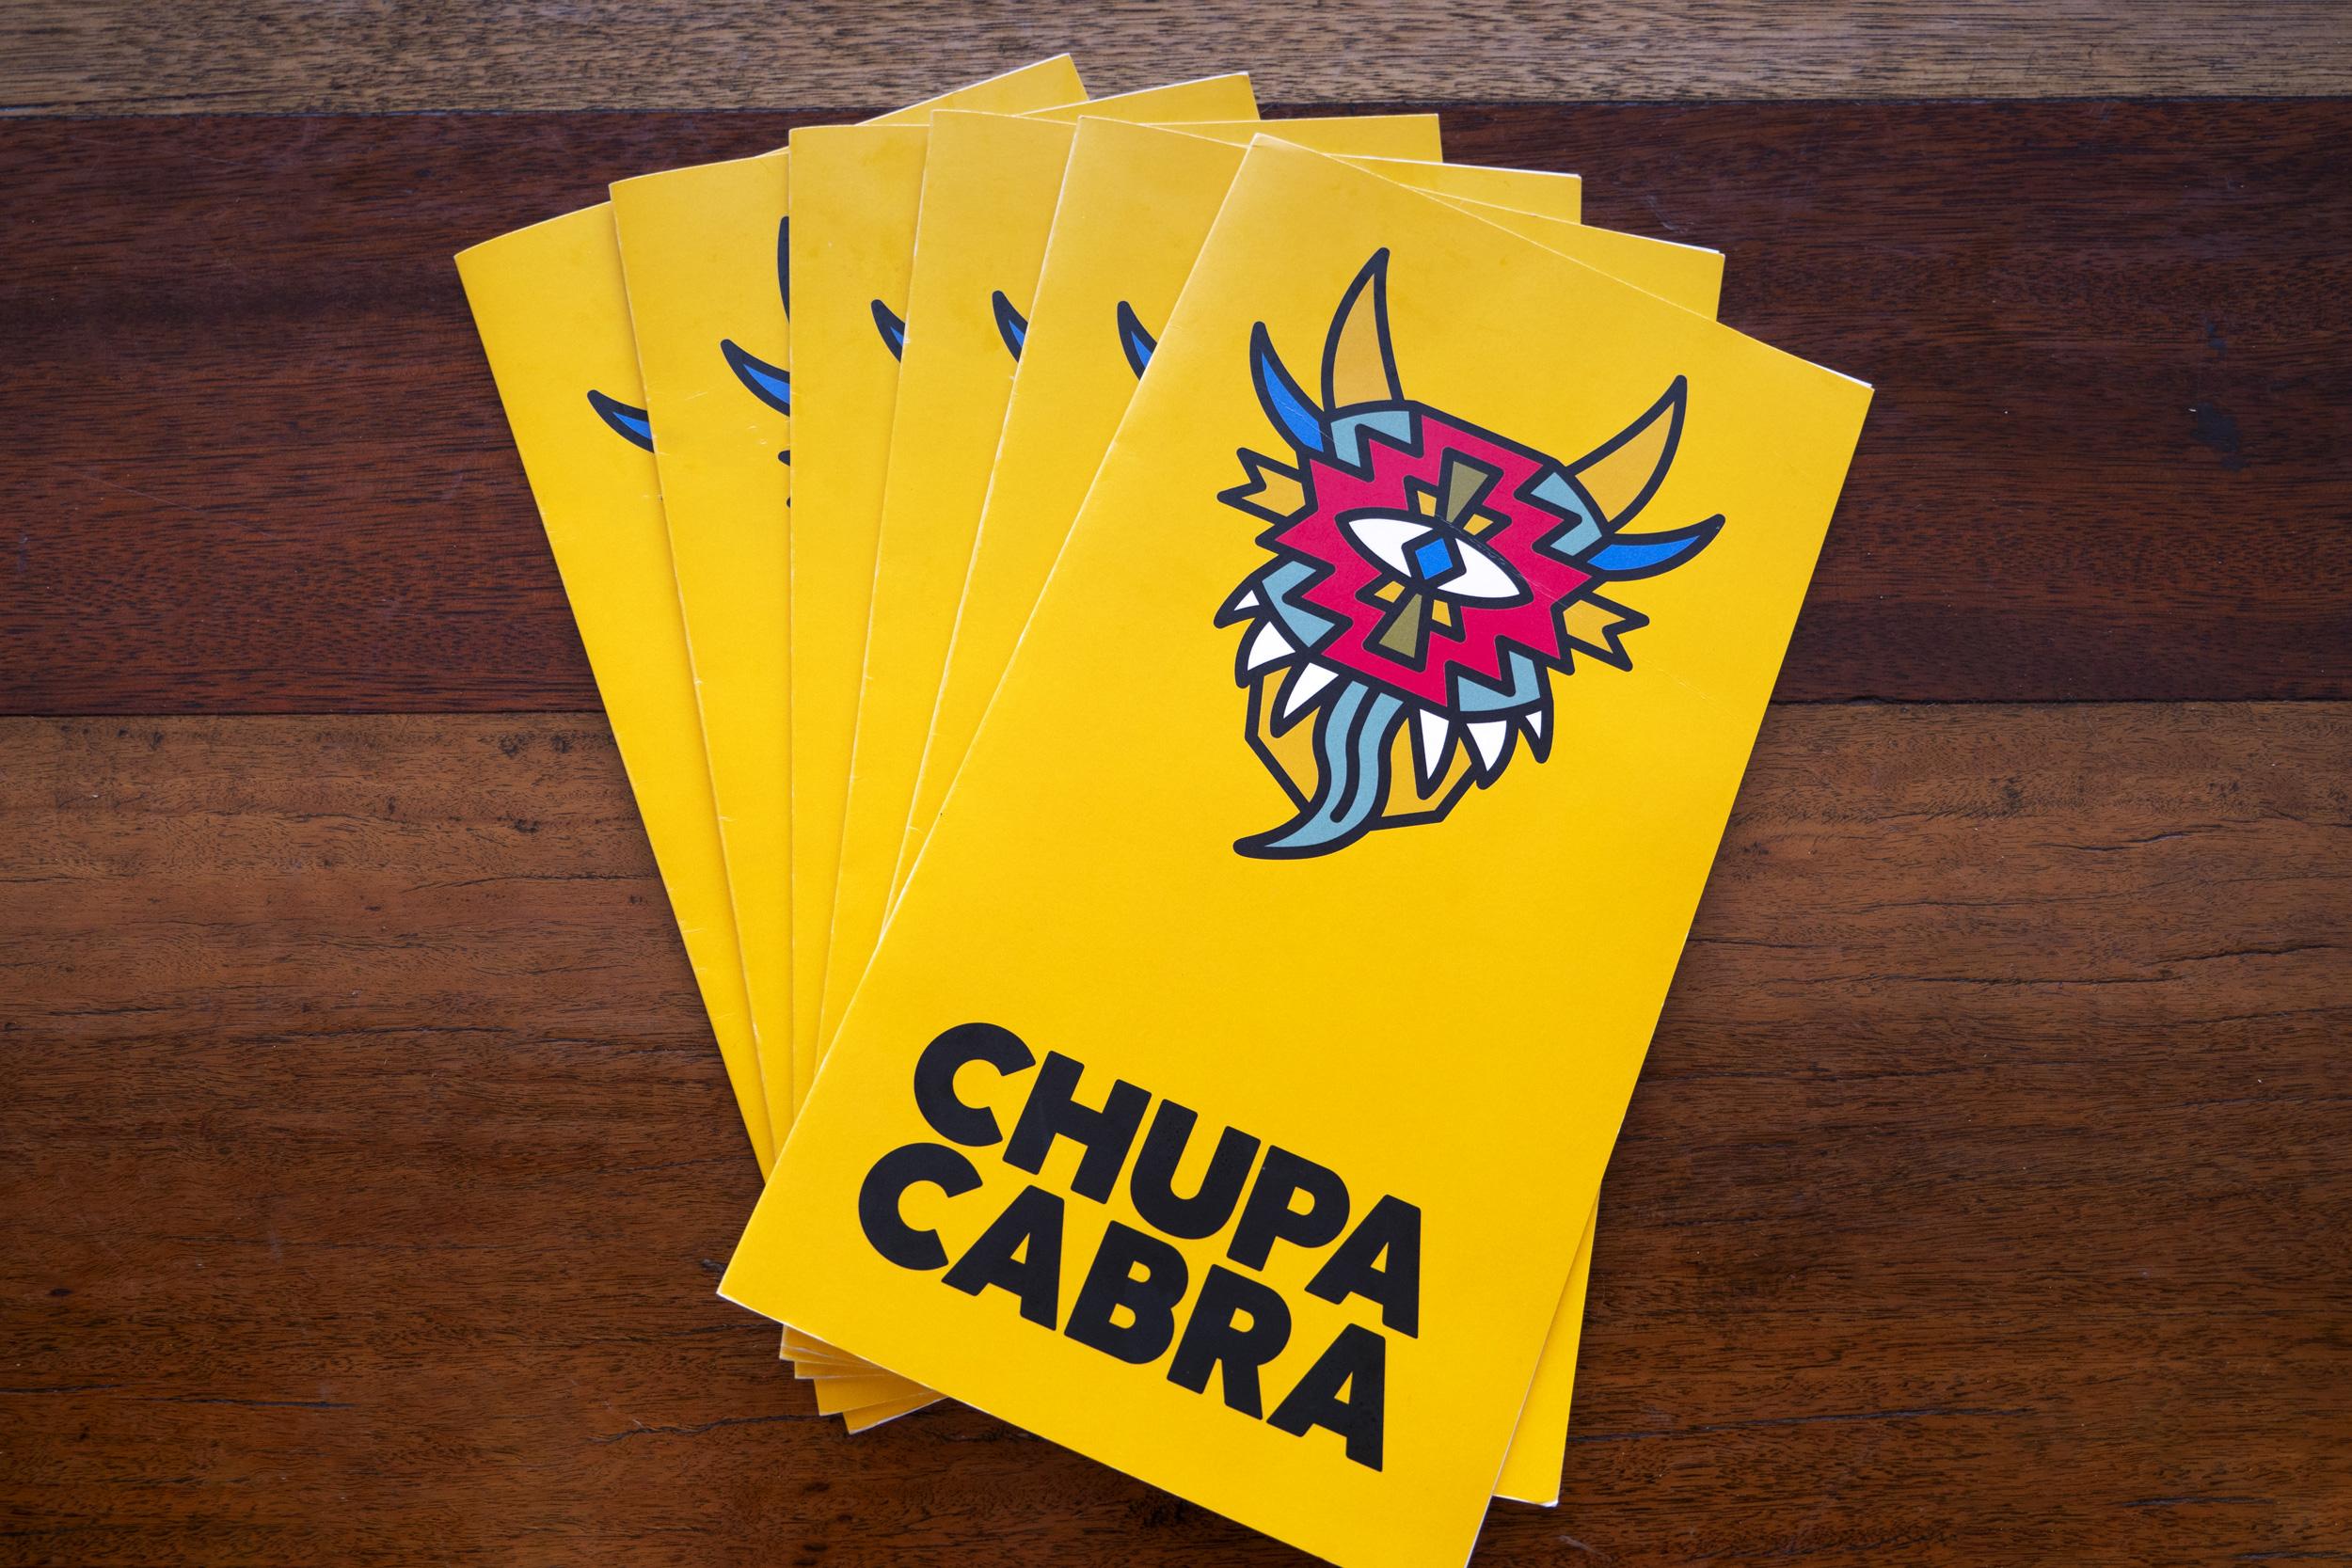 Chupacabra14.jpg